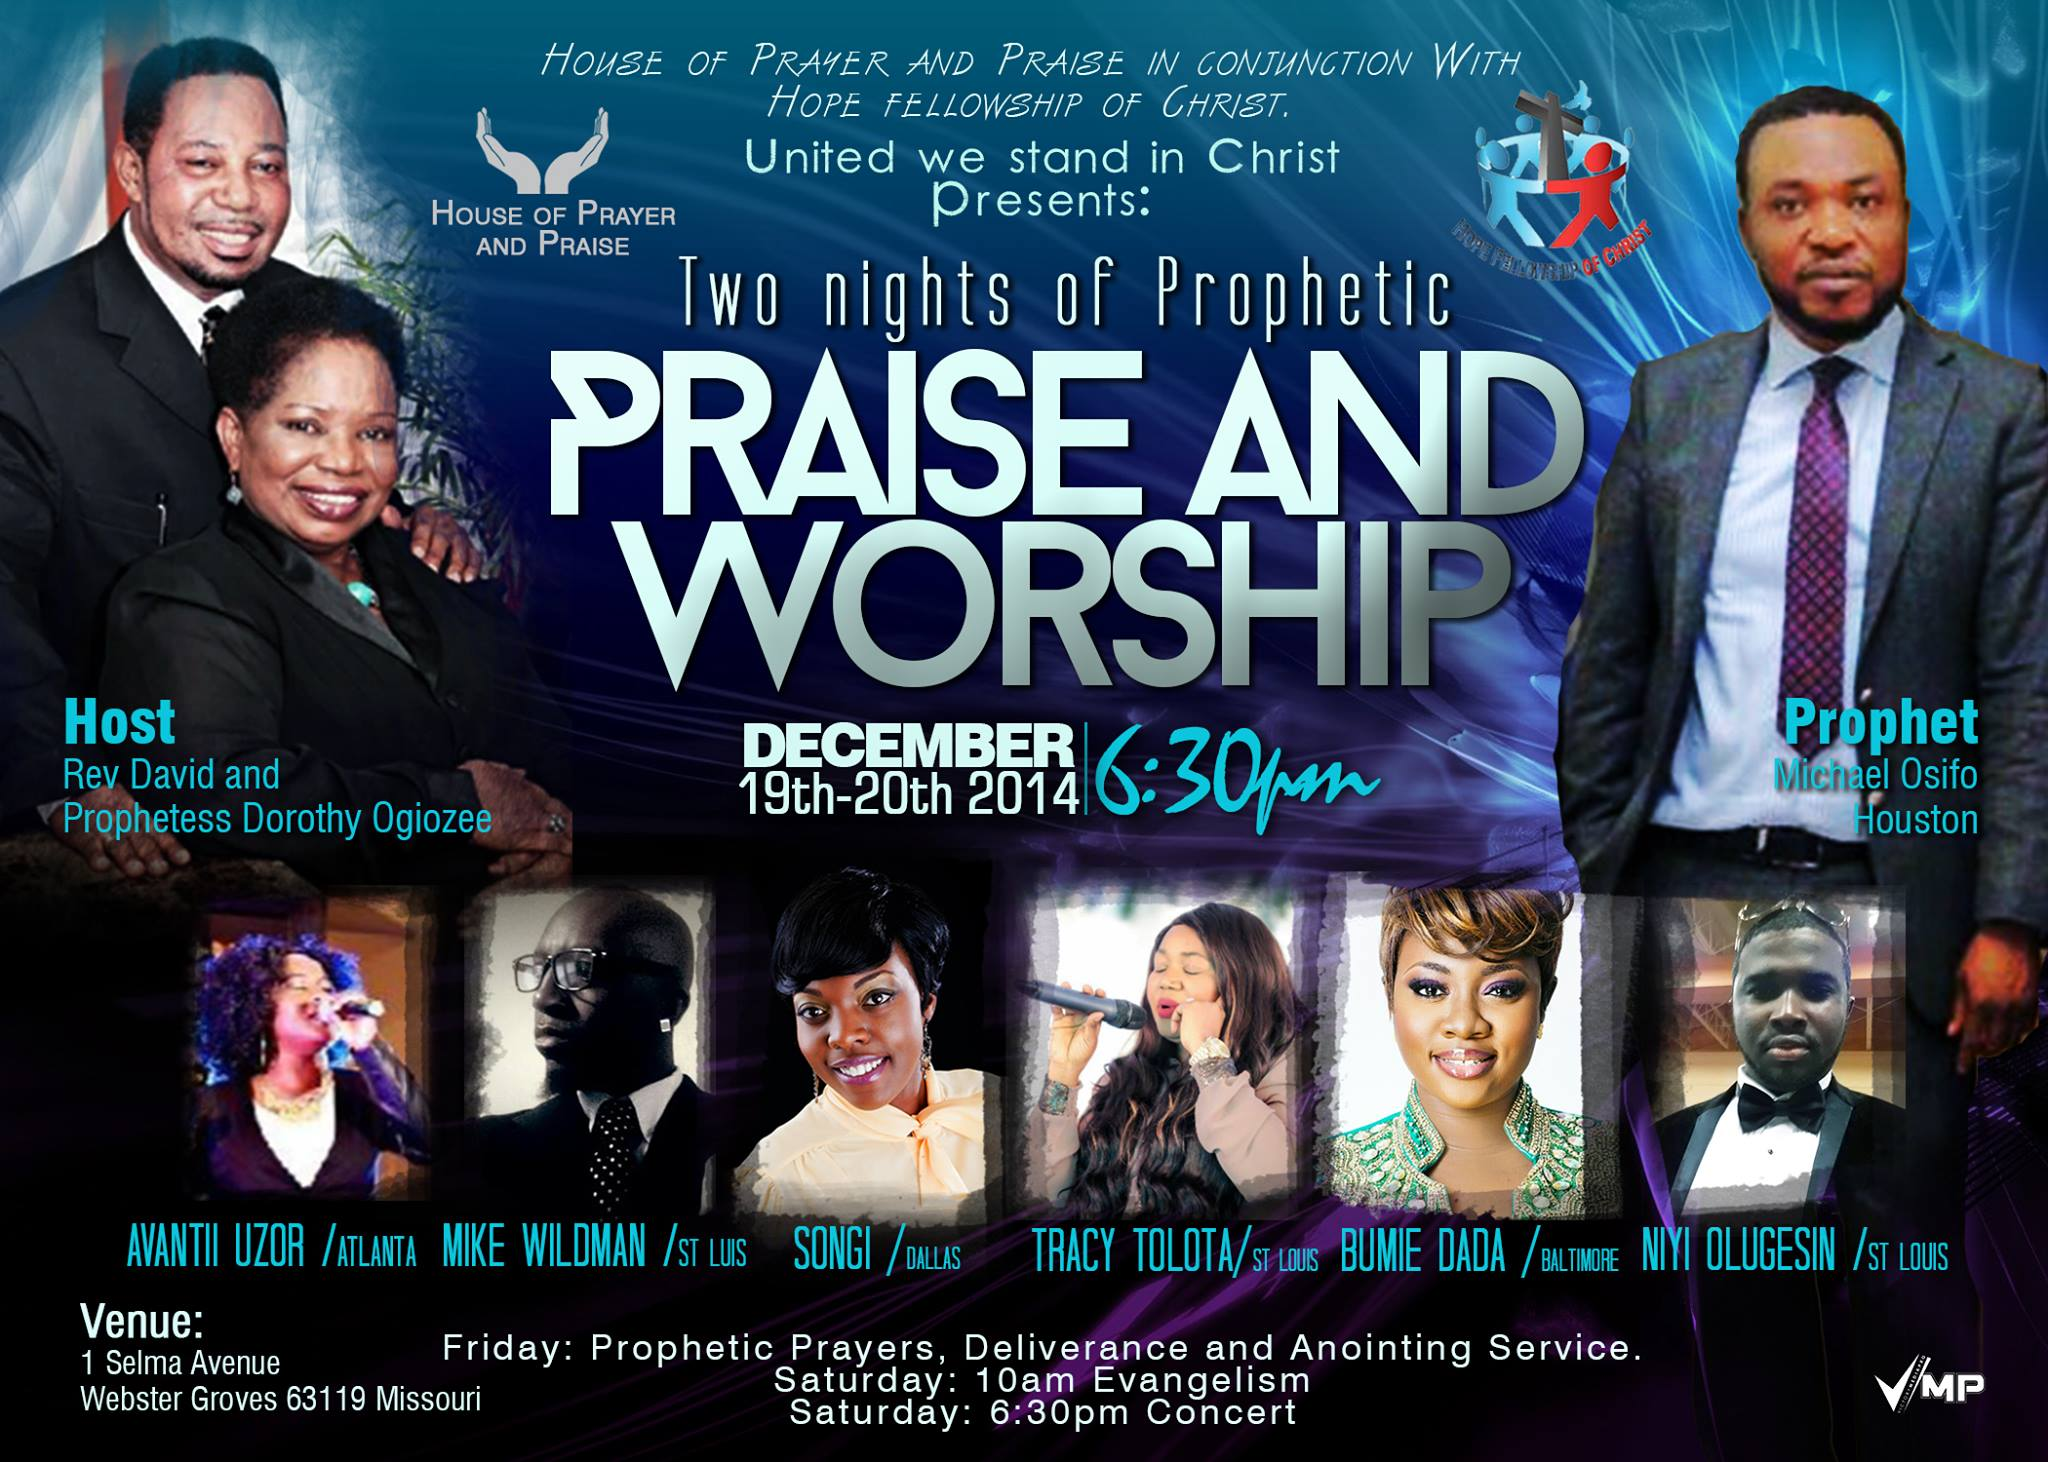 Praise and Worship, ST Louis